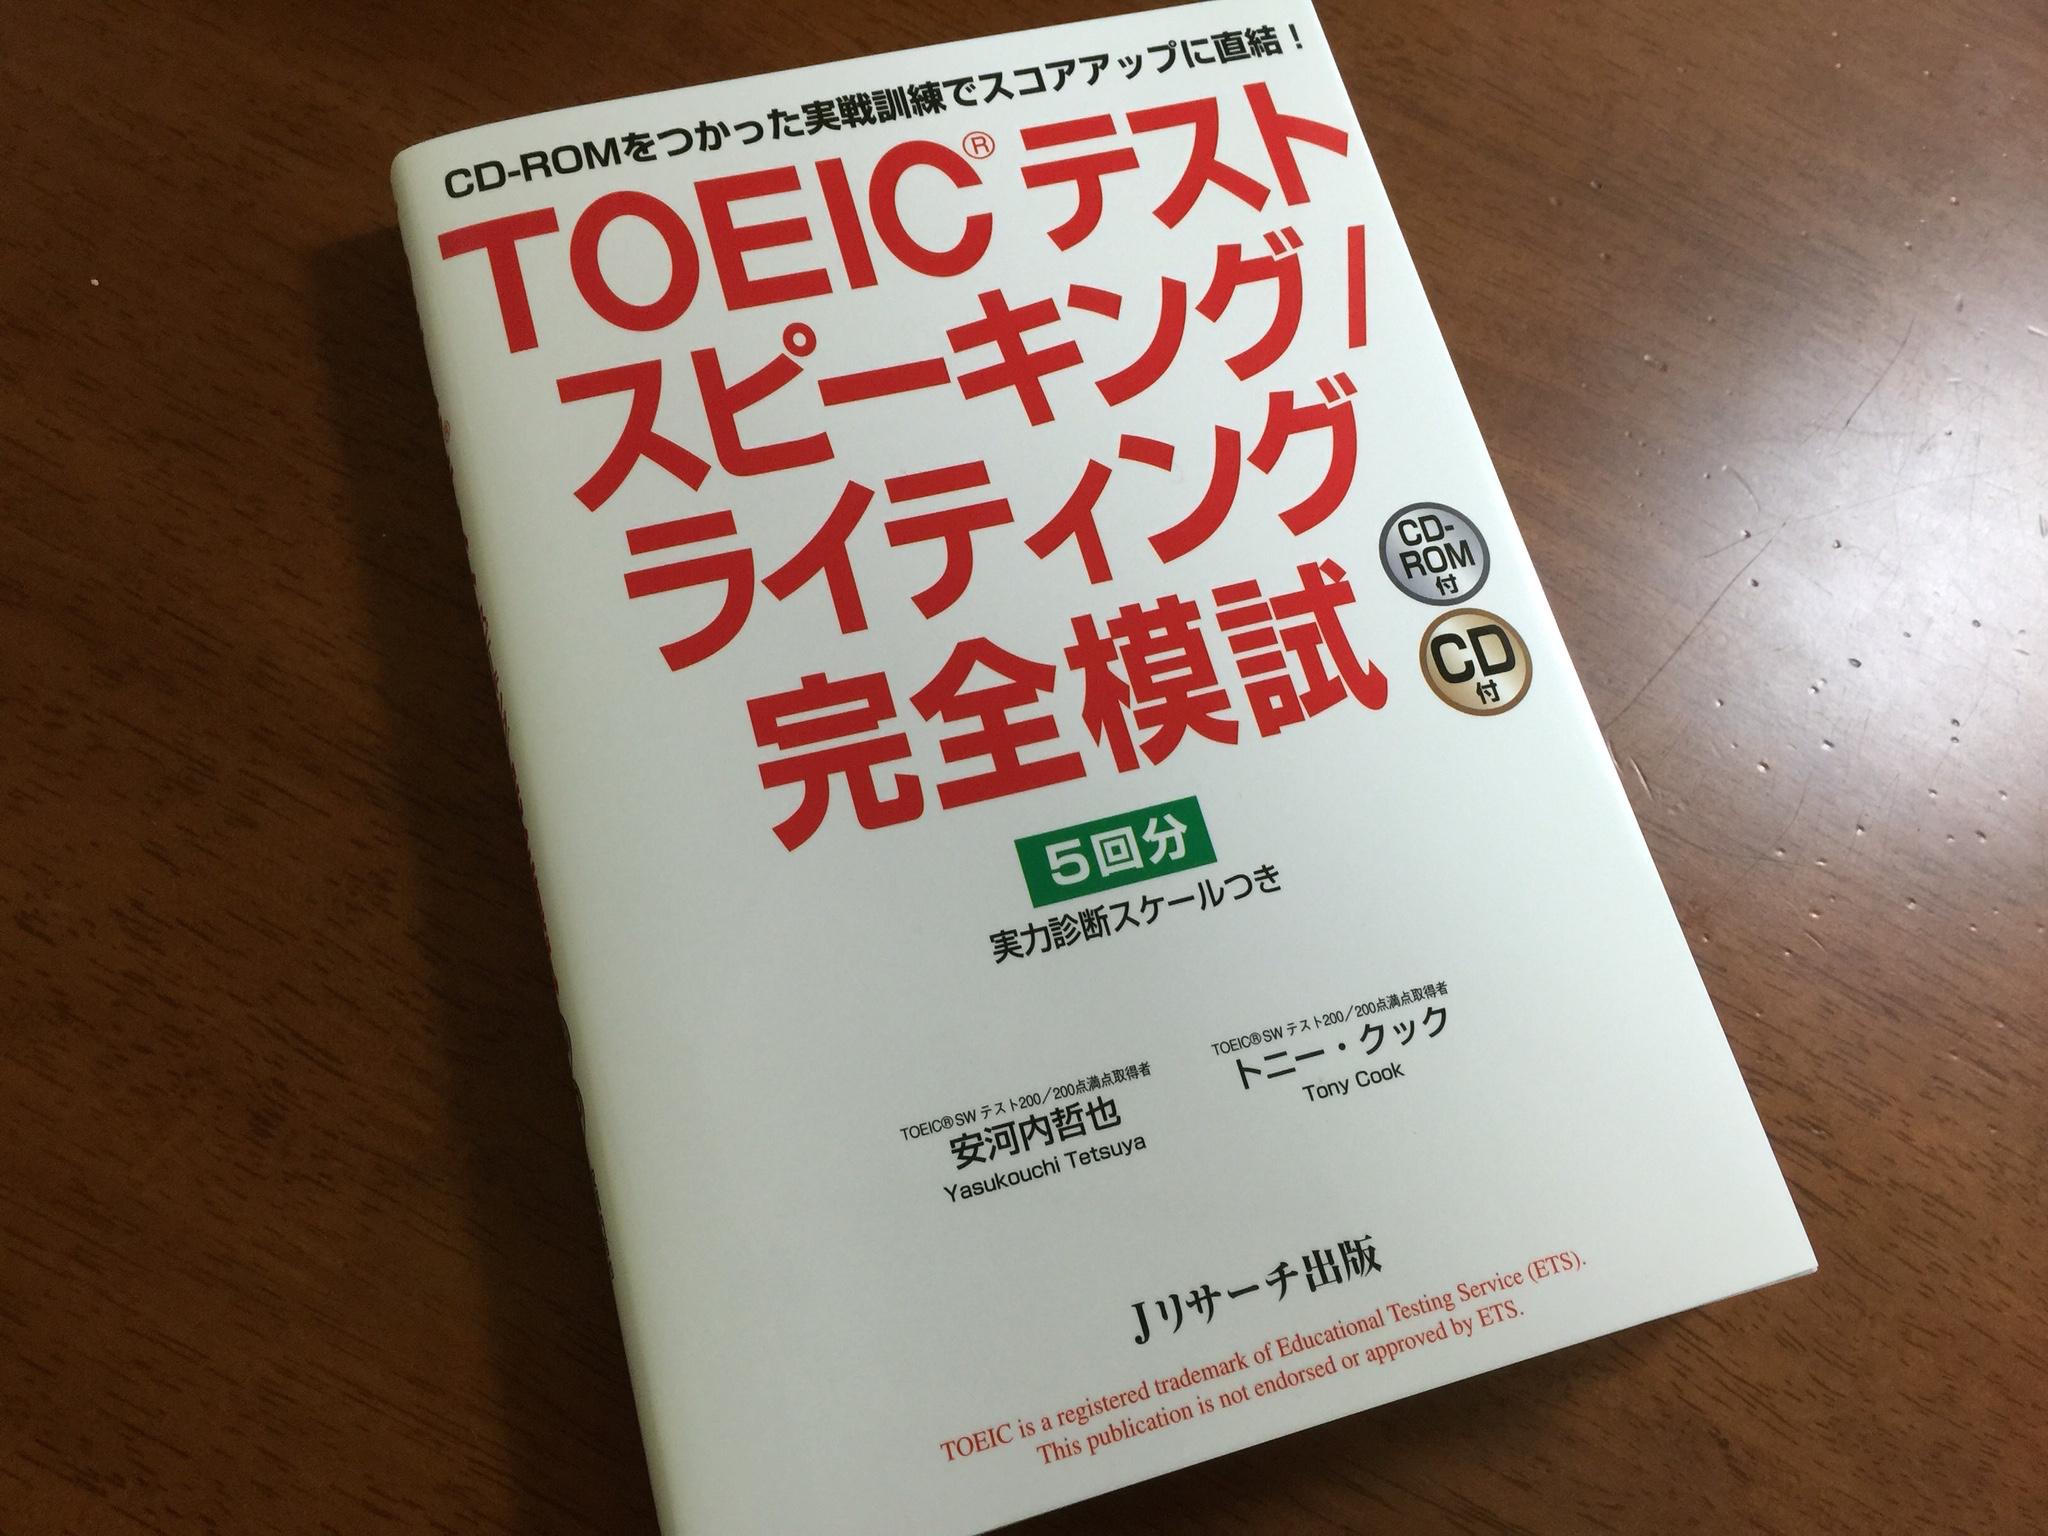 「TOEIC テスト スピーキング/ライティング完全模試」の感想・レビュー①